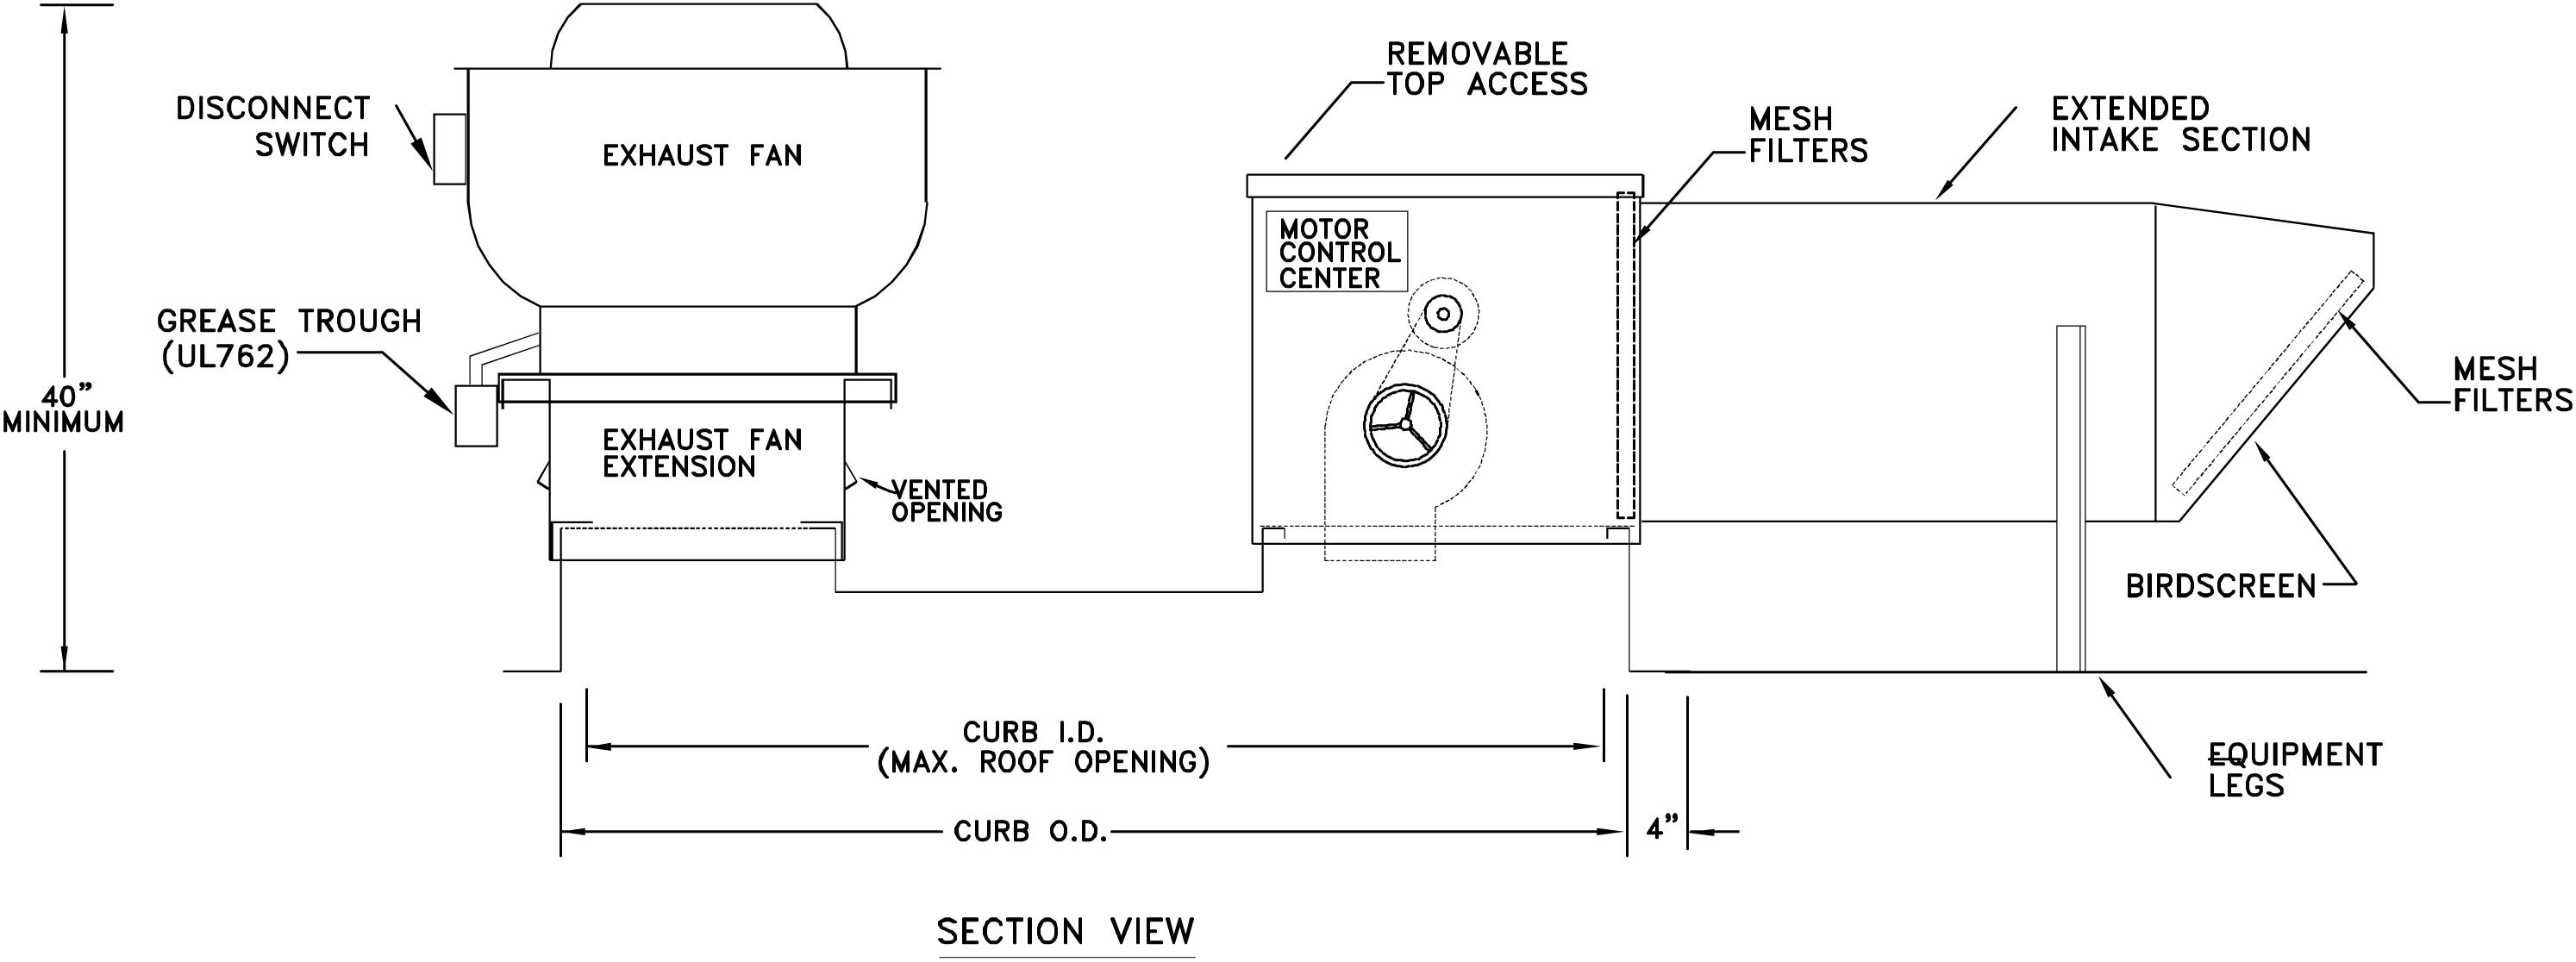 Rooftop Supply Fan Amp Fantech Offers Fresh Air Appliances